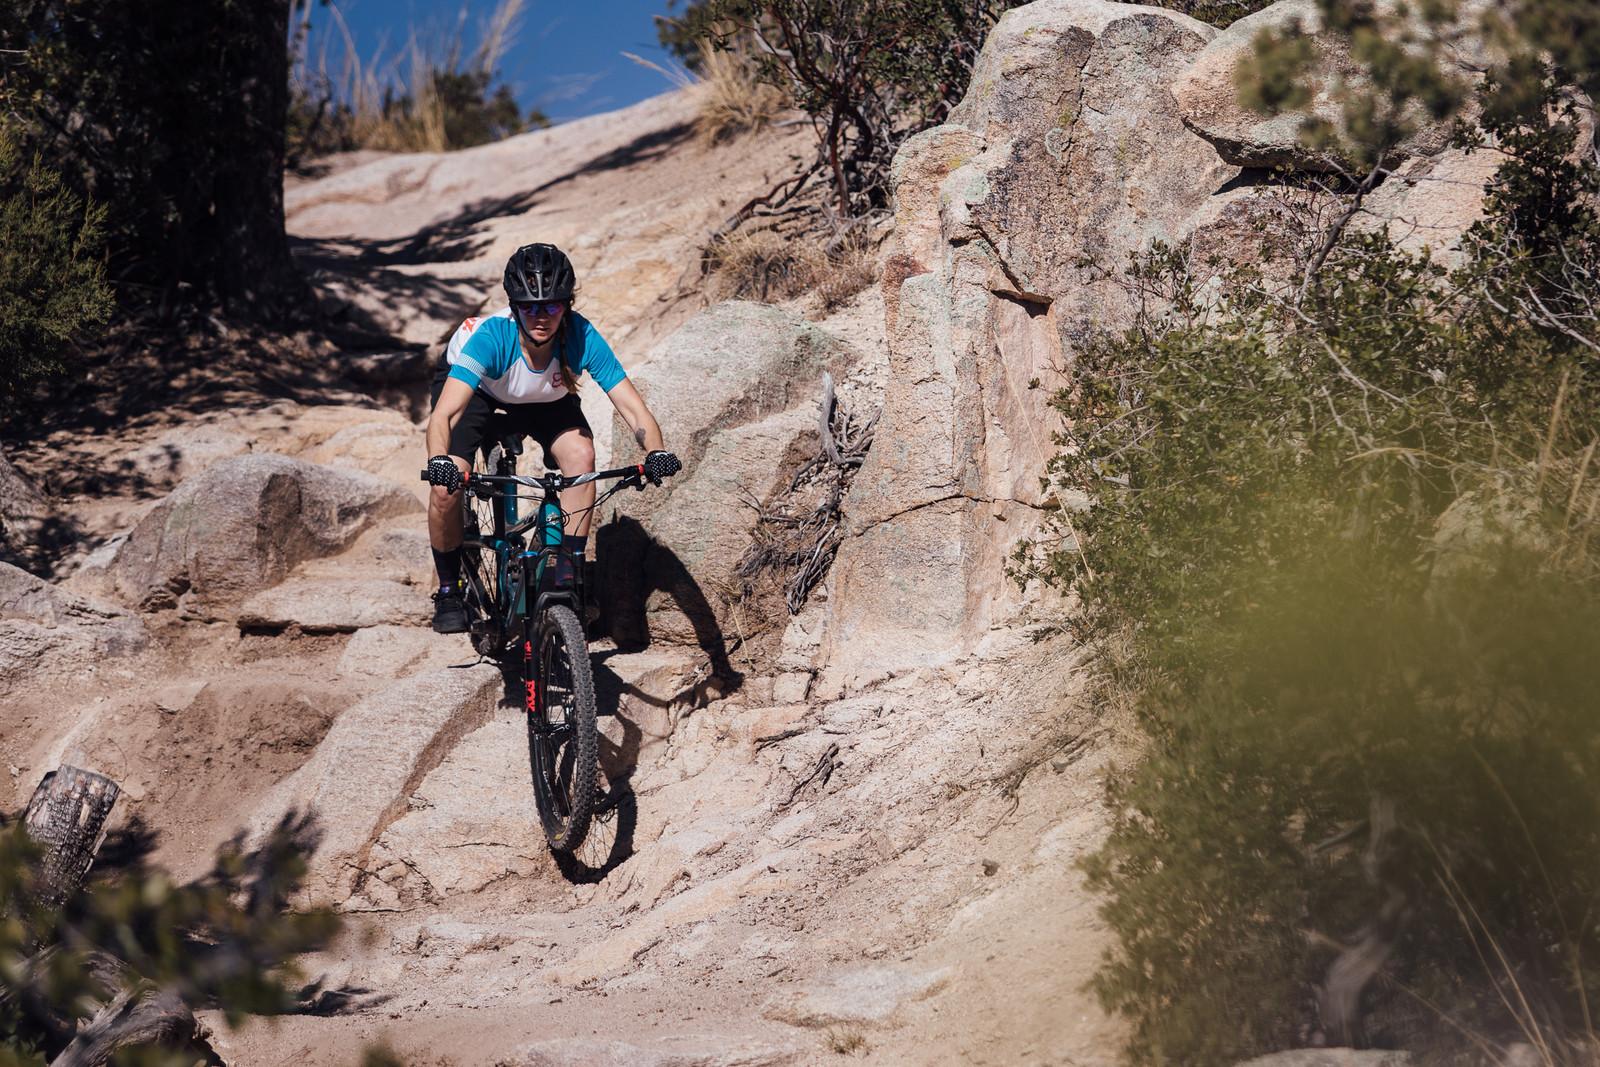 Yeti Beti SB5 Carbon XT / SLX - 2017 Vital MTB Test Sessions - Yeti Beti SB5 Carbon XT / SLX - 2017 Vital MTB Test Sessions - Mountain Biking Pictures - Vital MTB